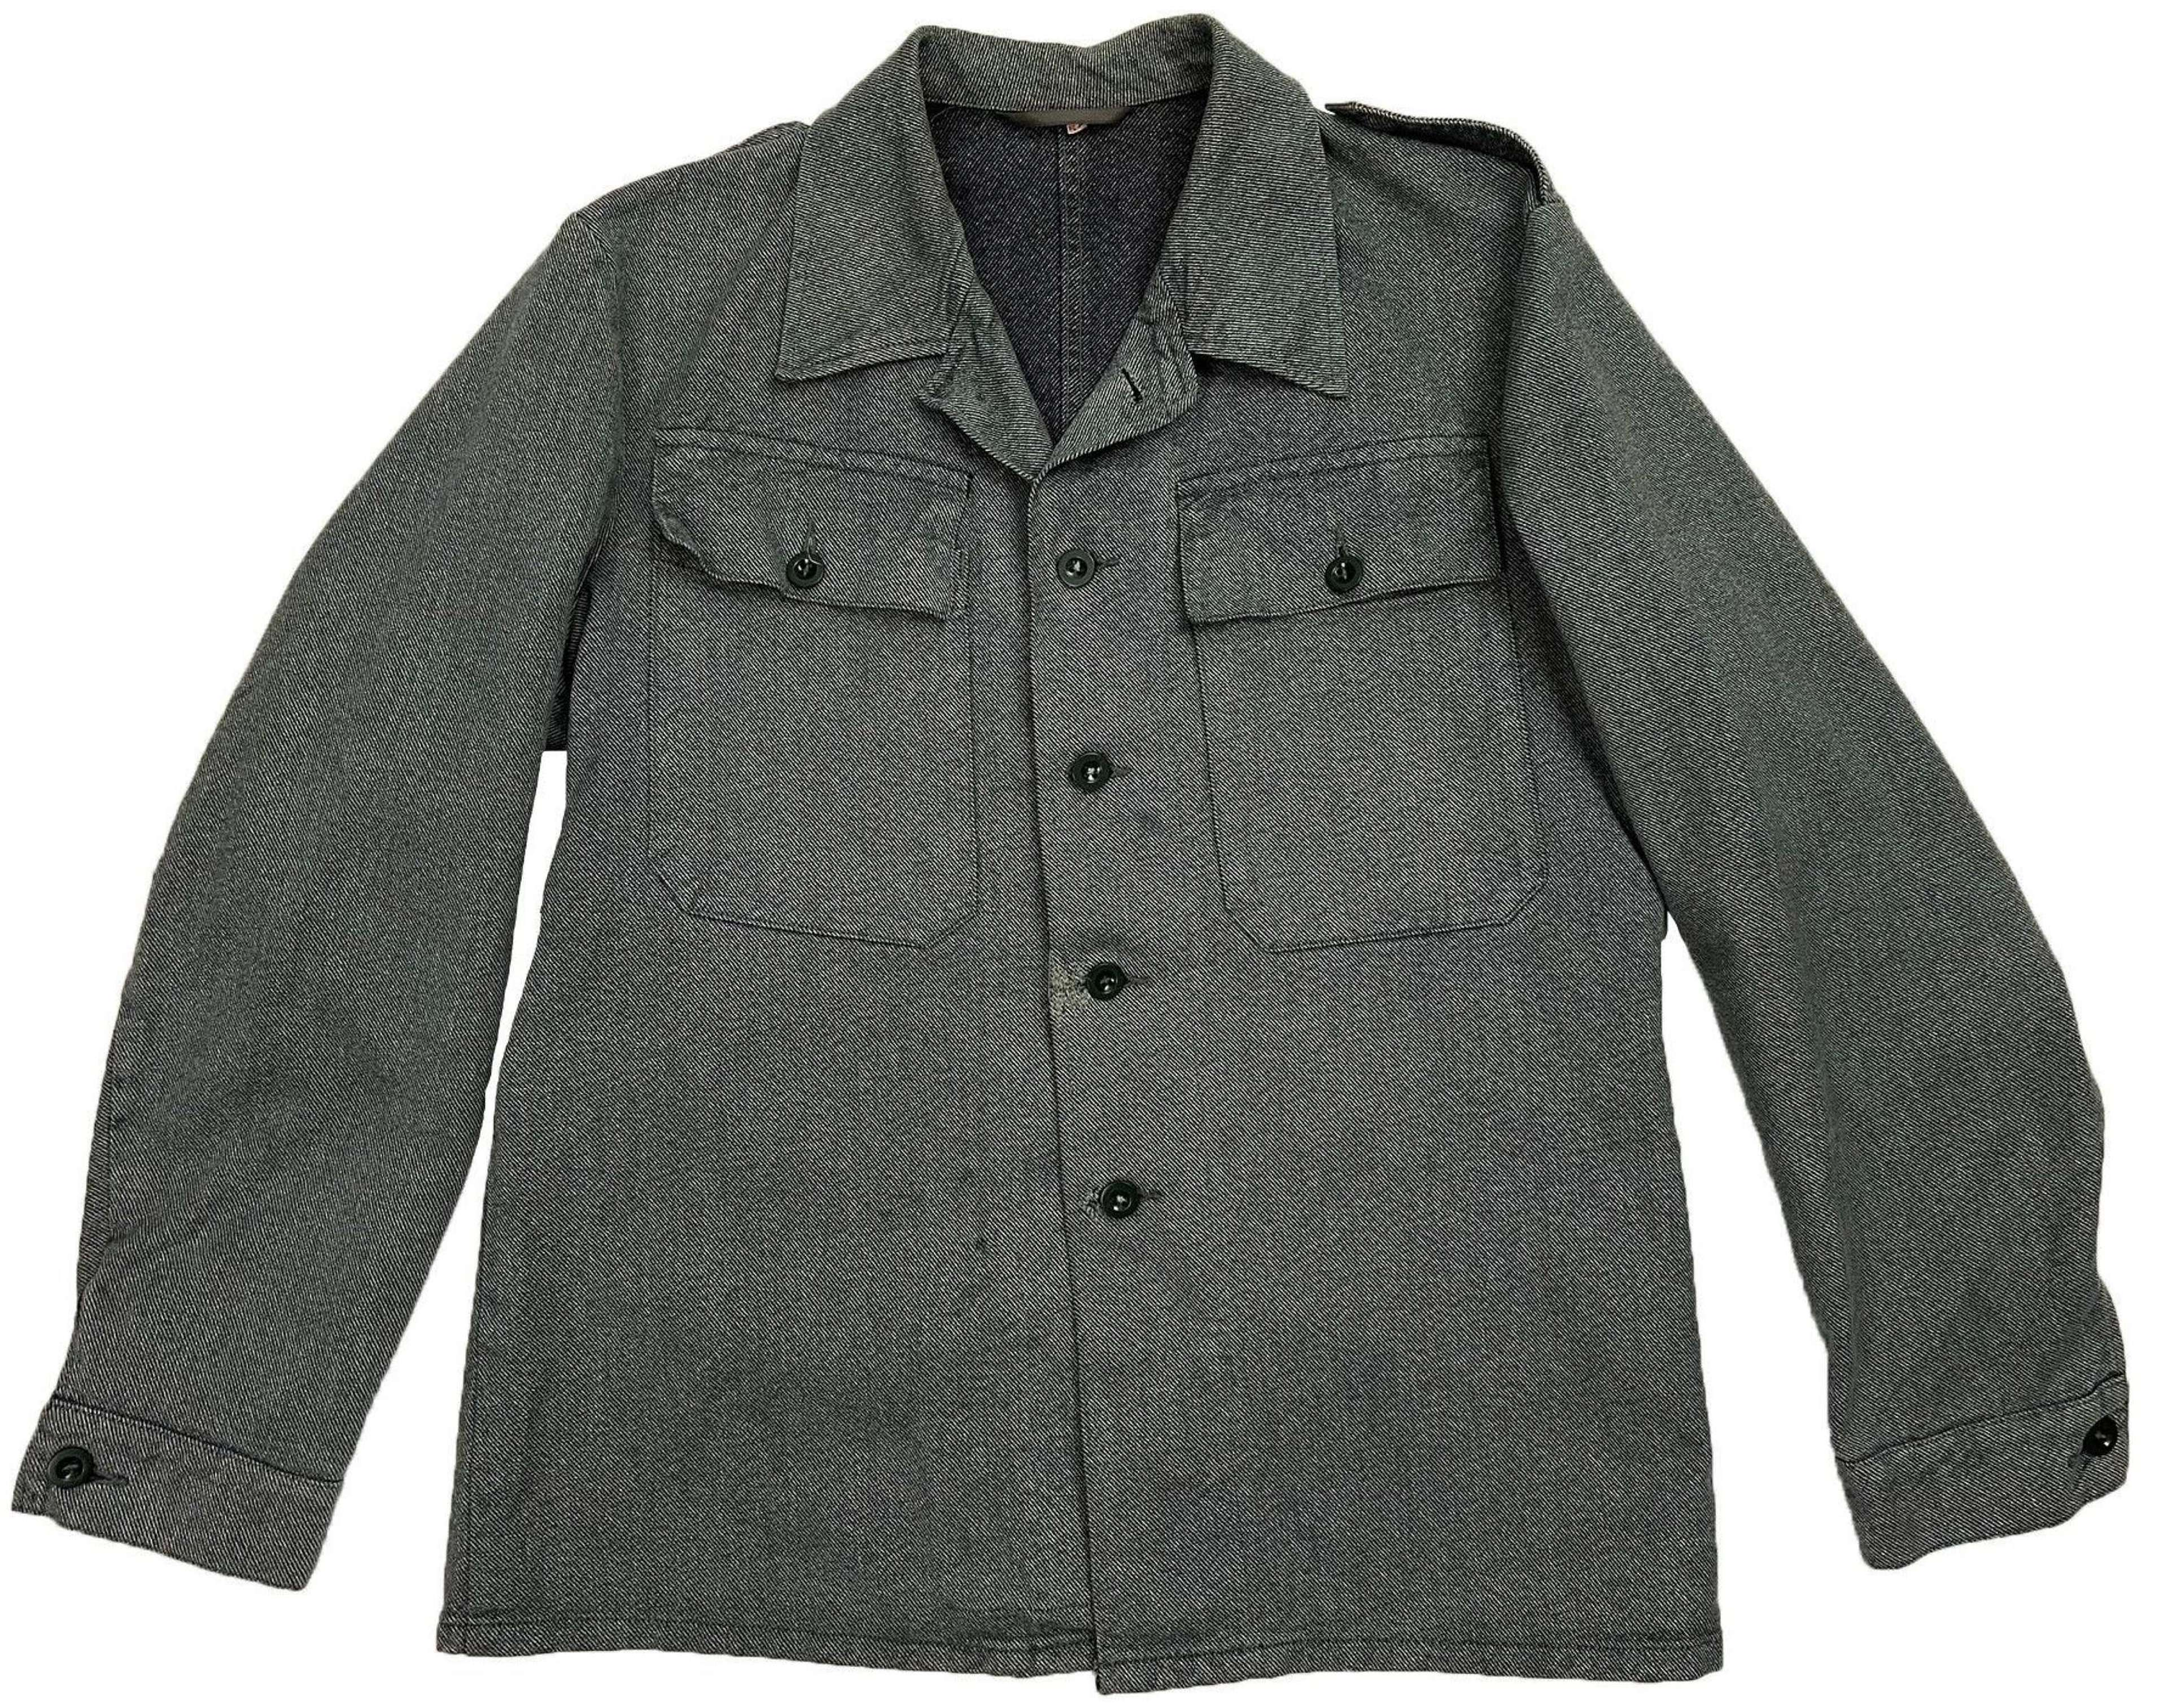 Original 1950s Swiss Denim Military Work Jacket